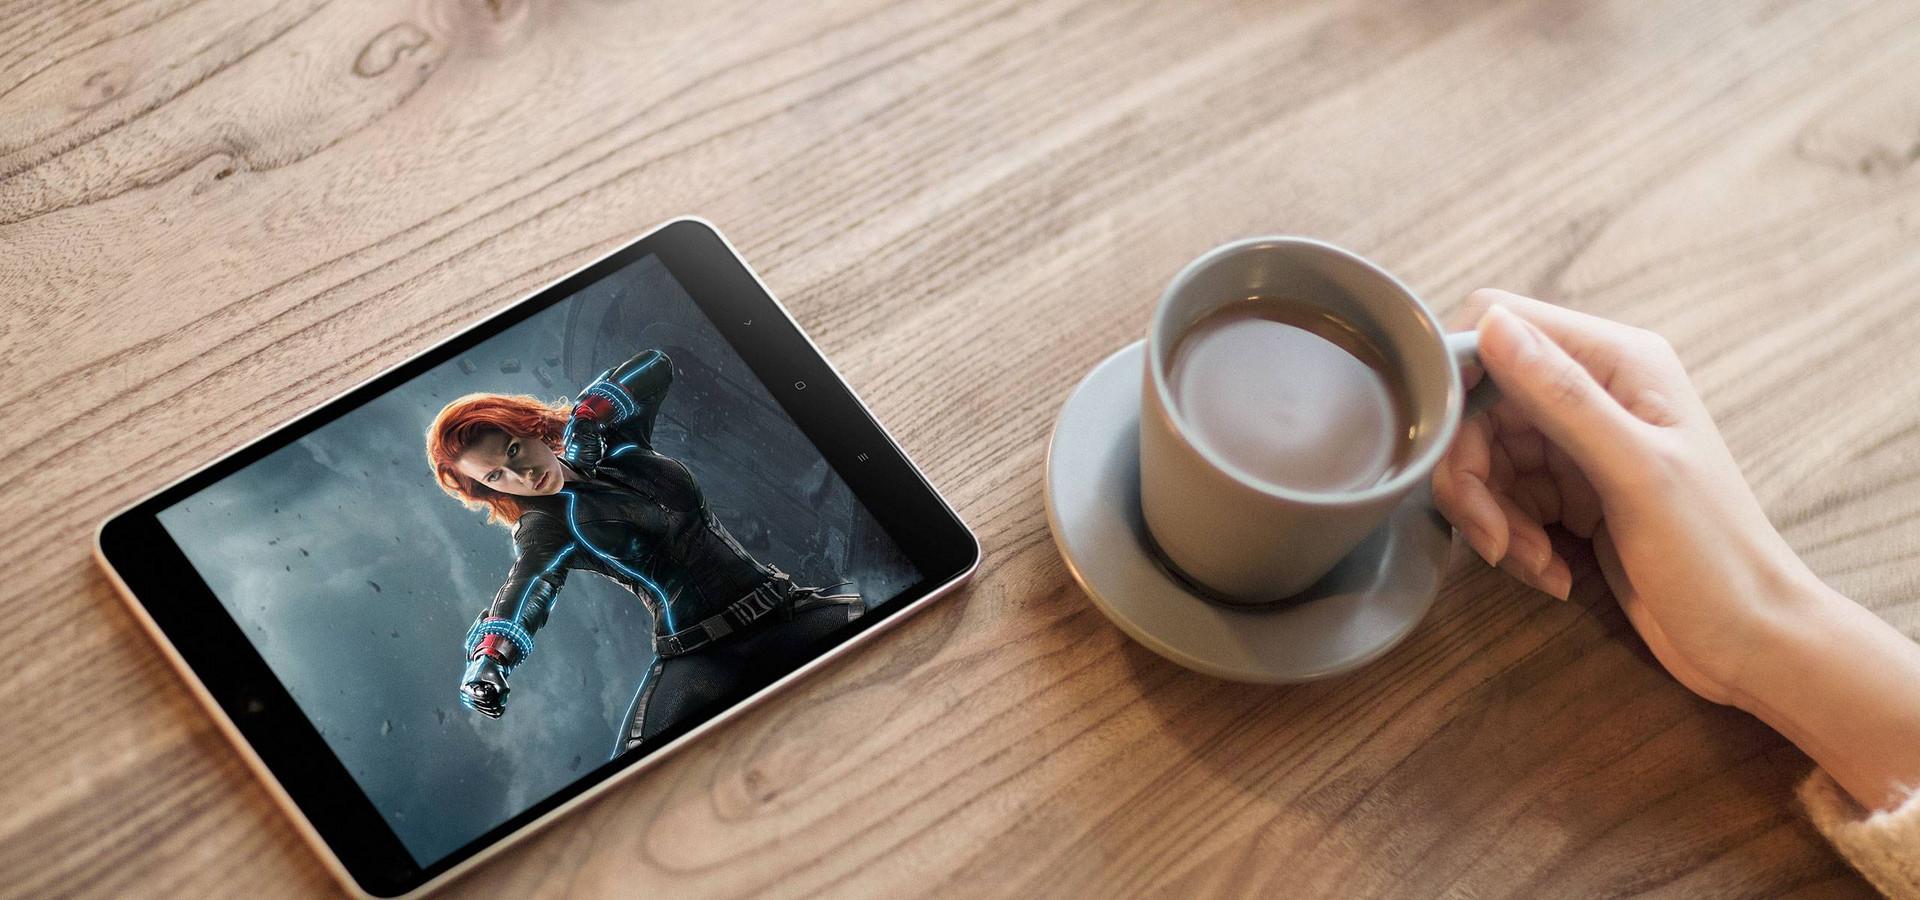 xiaomi mi pad 3 7 9 zoll tablet mit 13 mp kamera kostet. Black Bedroom Furniture Sets. Home Design Ideas